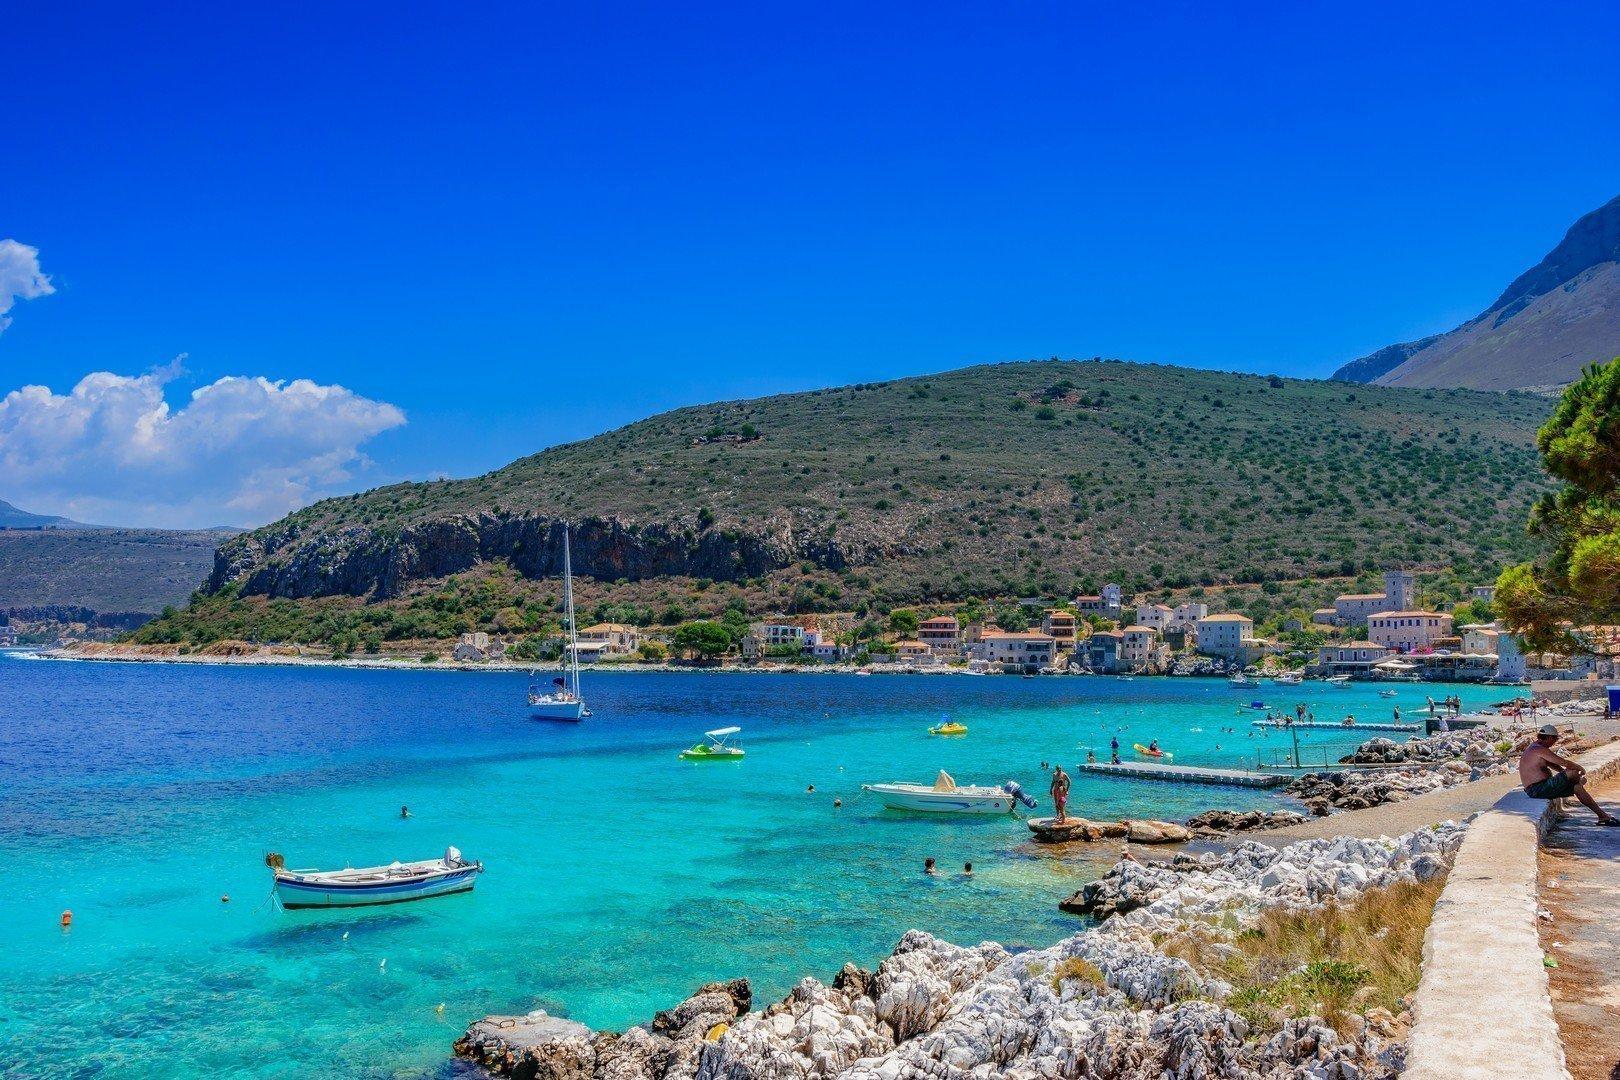 Mani, Peloponeso, Peloponnese, Limeni